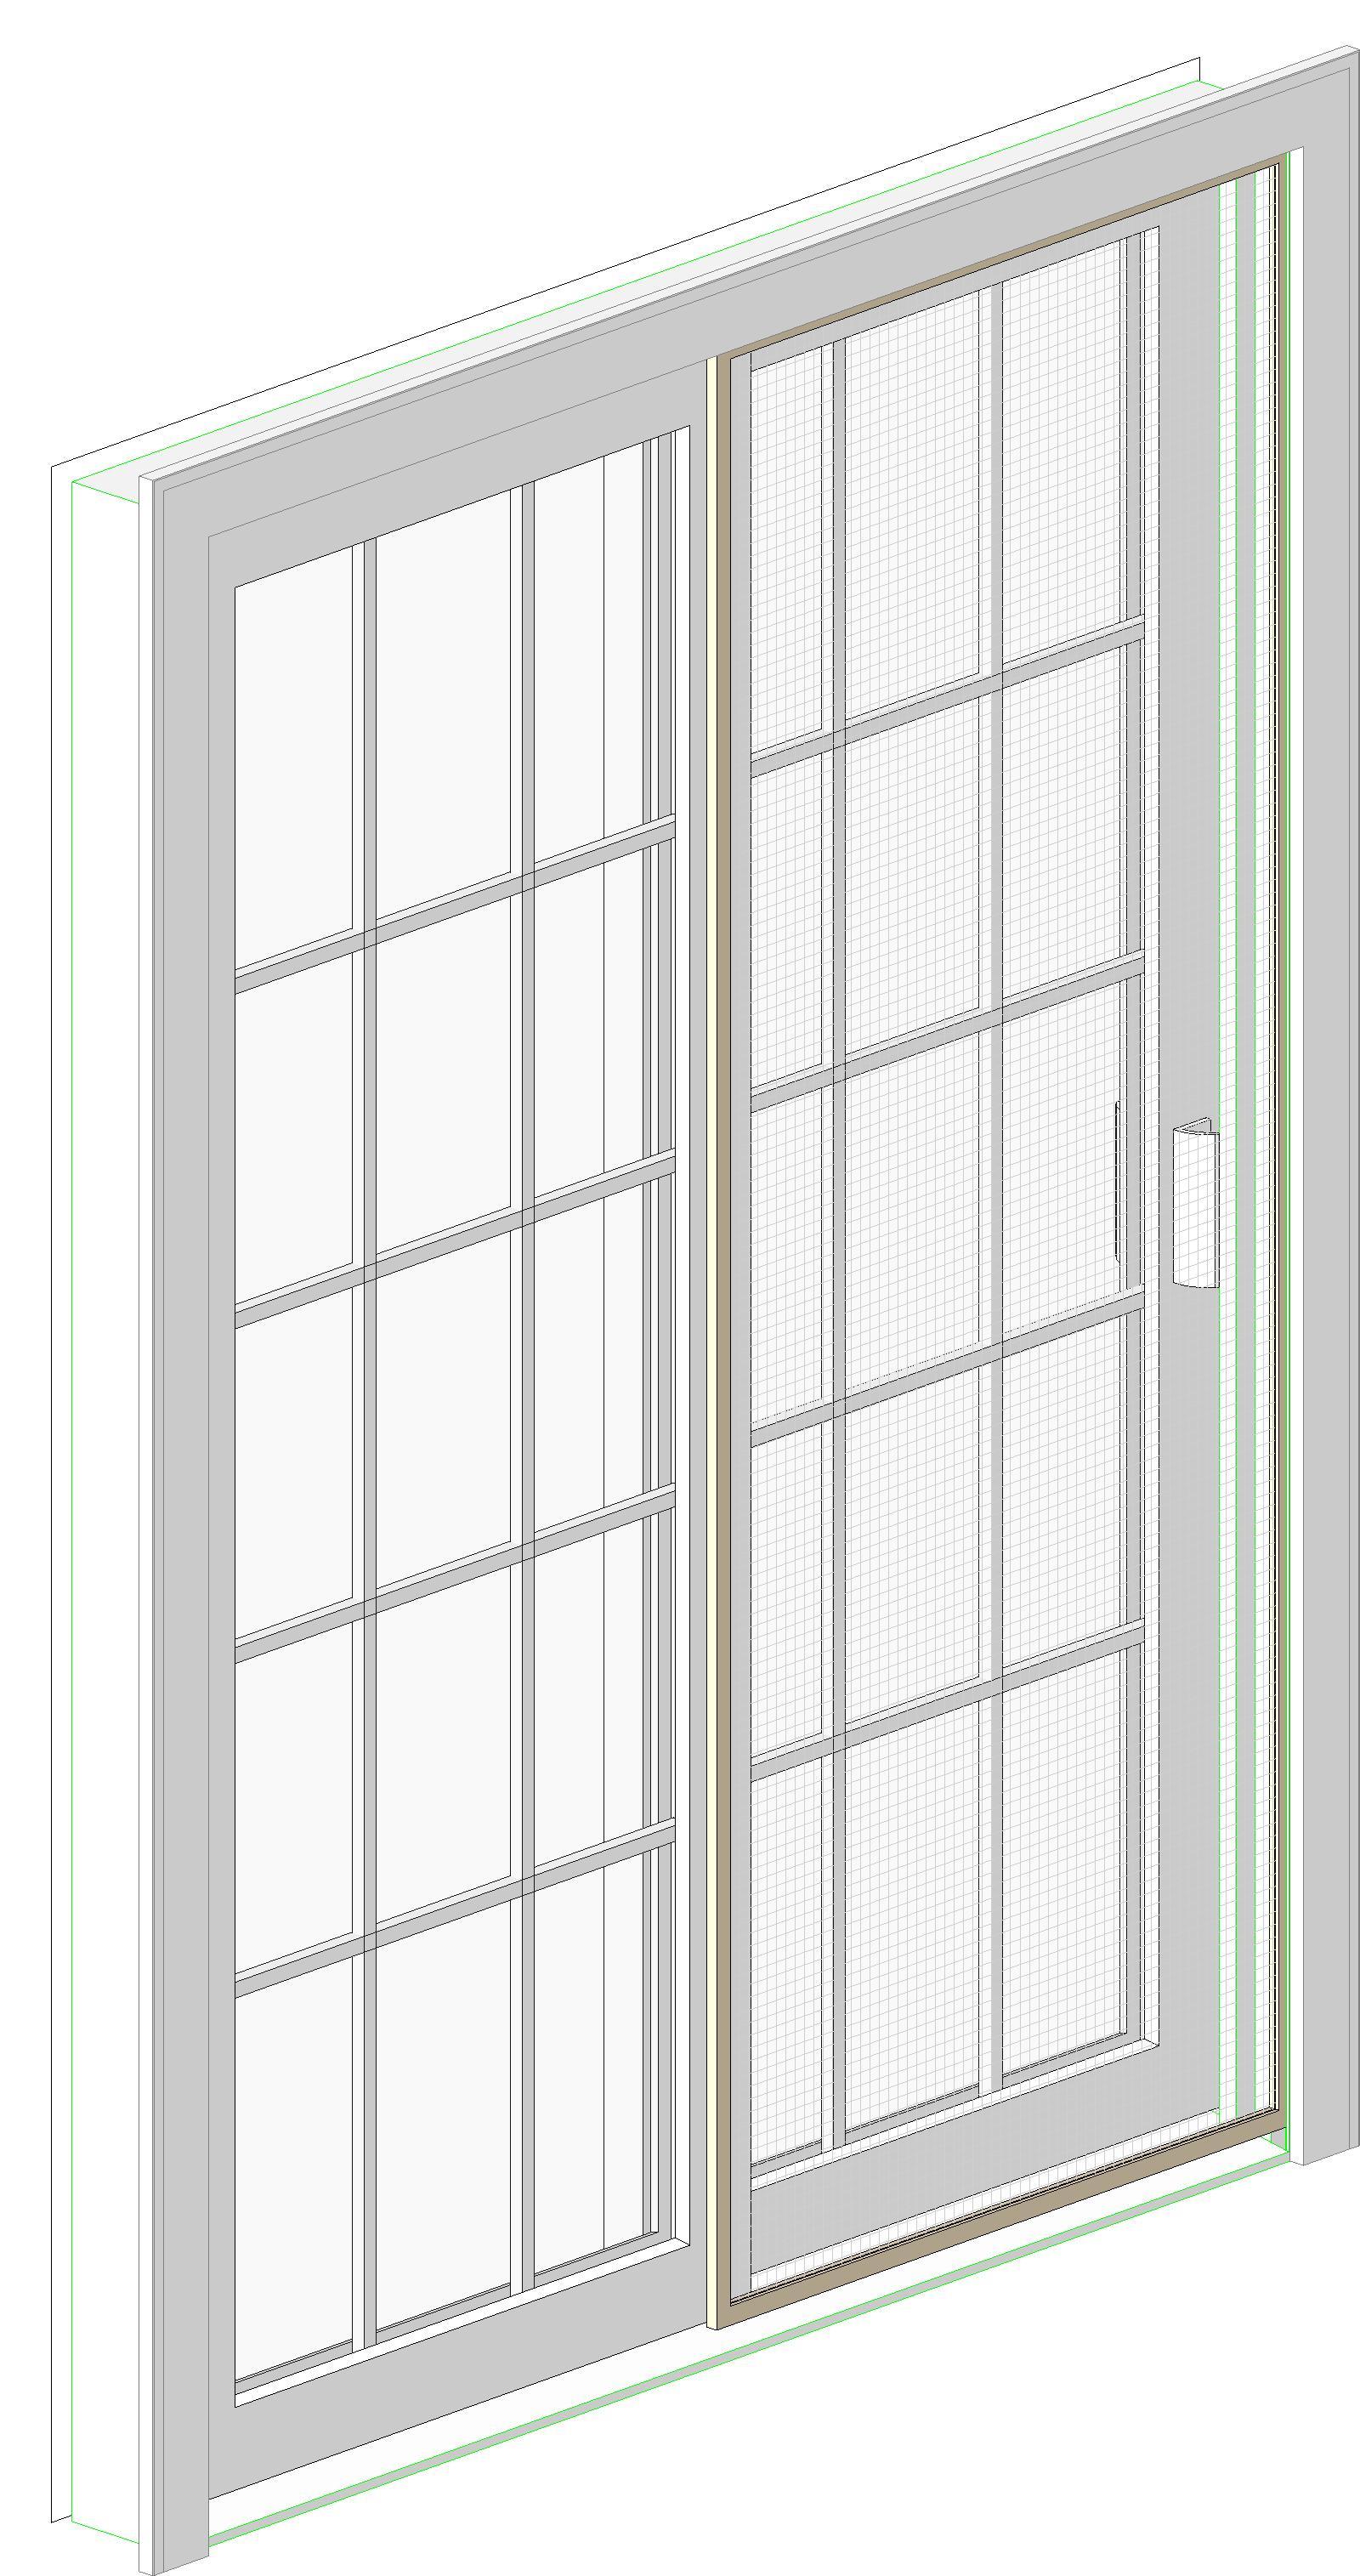 3030 #588744 Doors And Hardware: Sliding Doors: Vinyl ( Harvey Building Products ) save image Harvey Doors 43271600